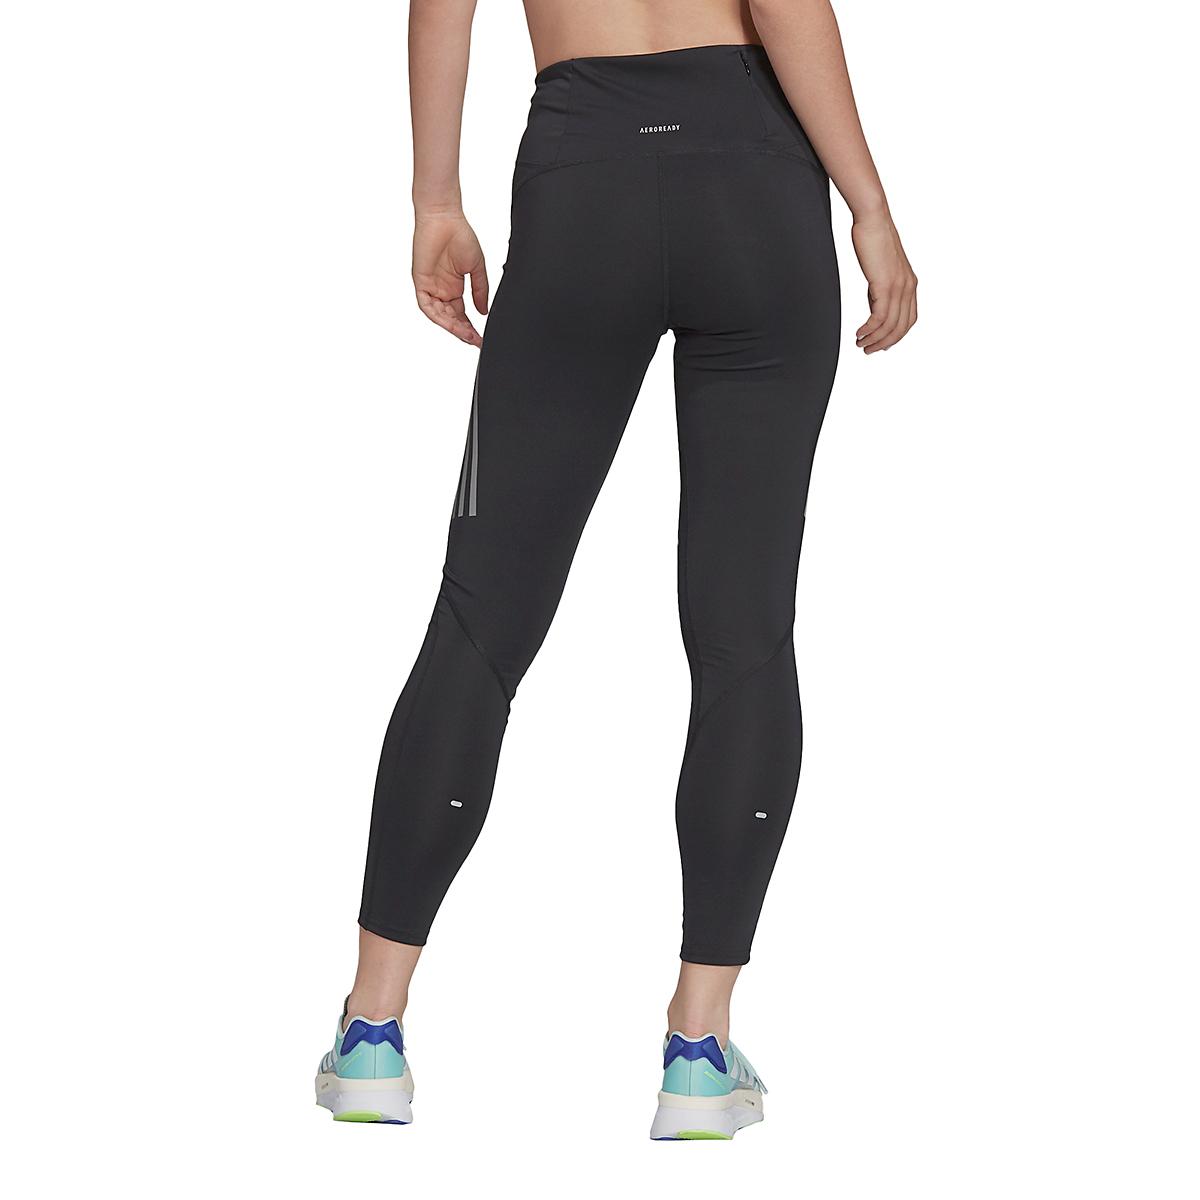 Women's Adidas Own The Run Running Leggings, , large, image 2